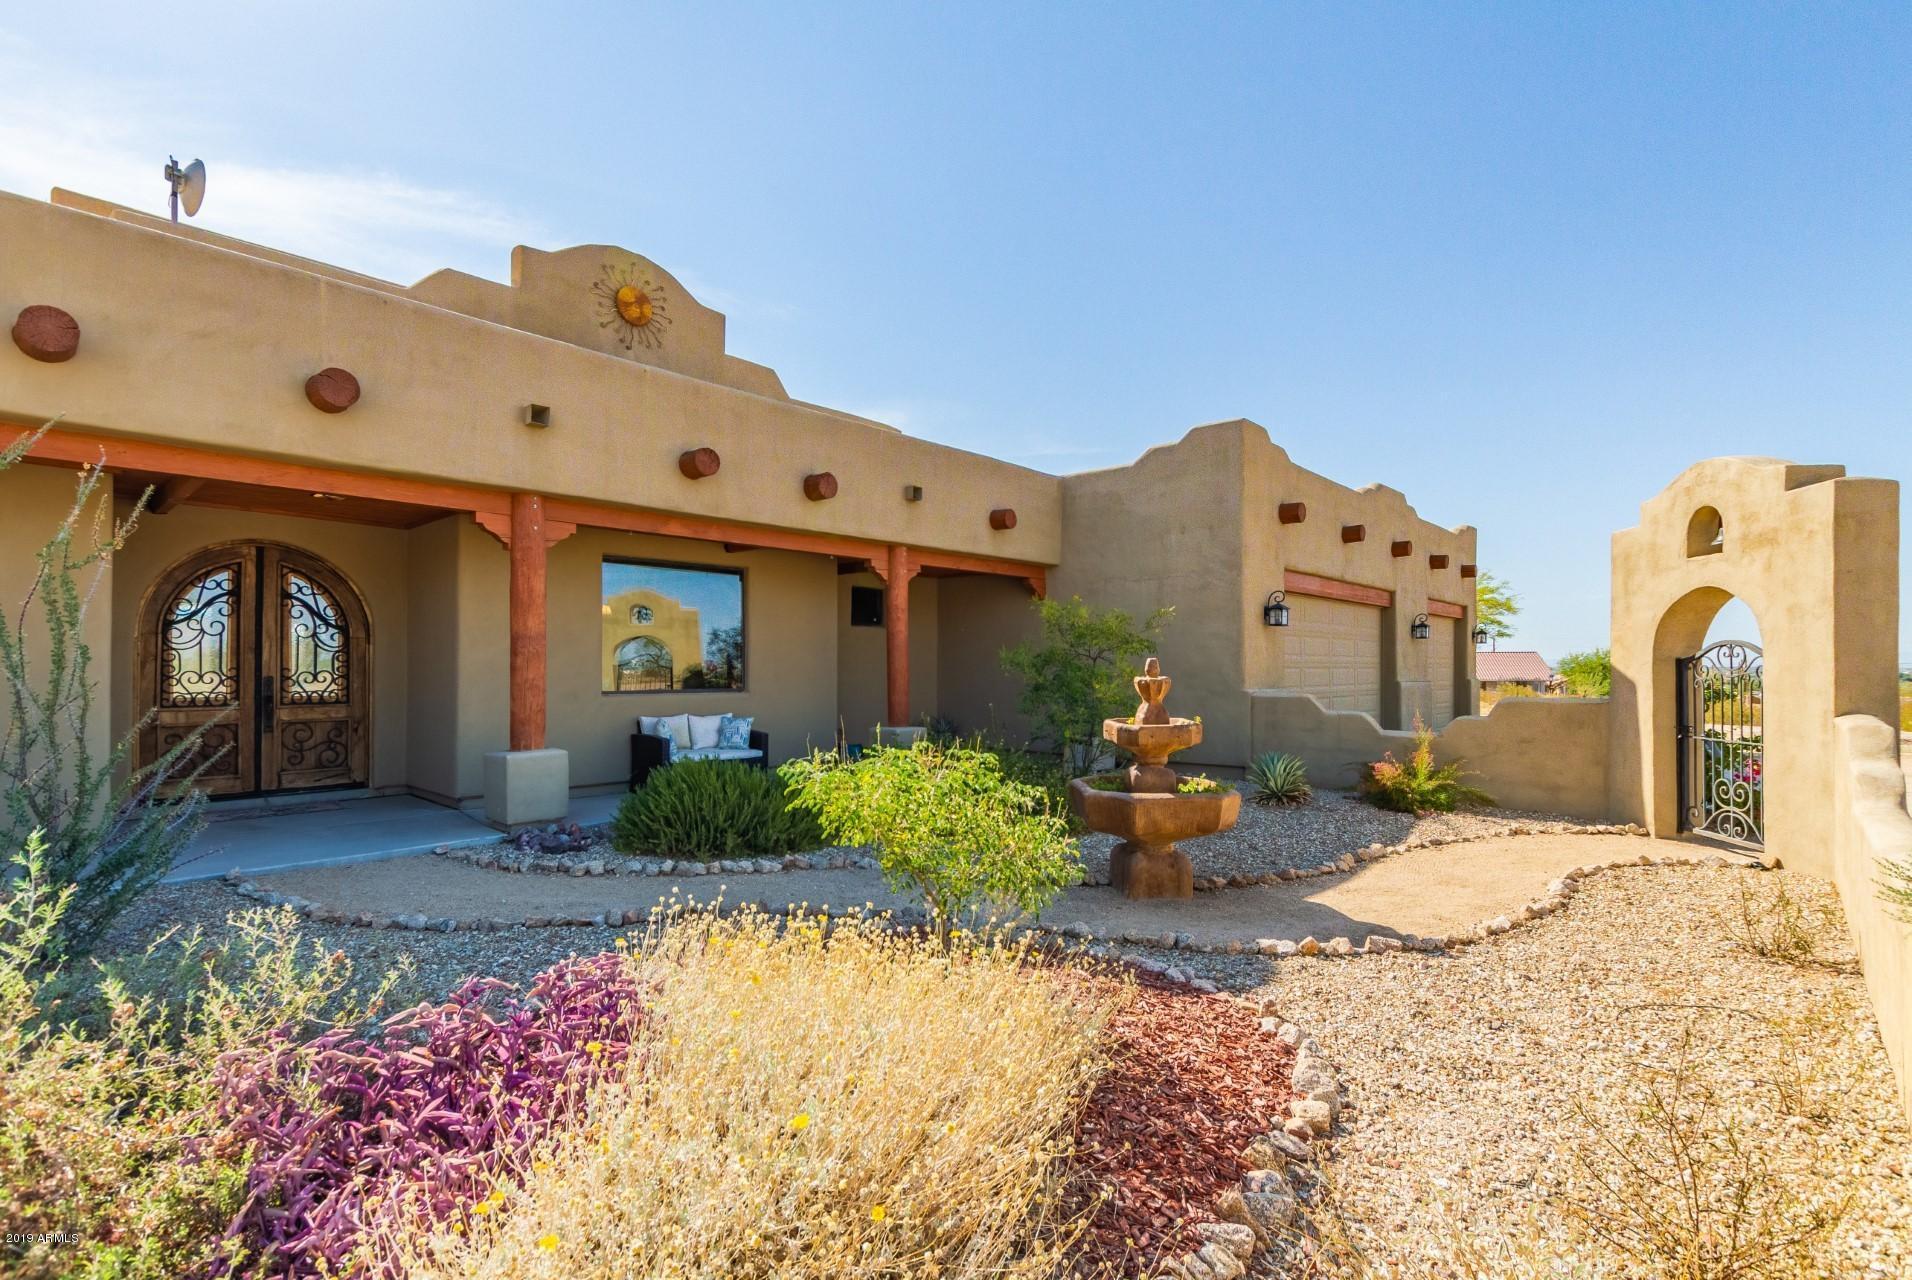 Photo of 8428 S 133rd Avenue, Goodyear, AZ 85338